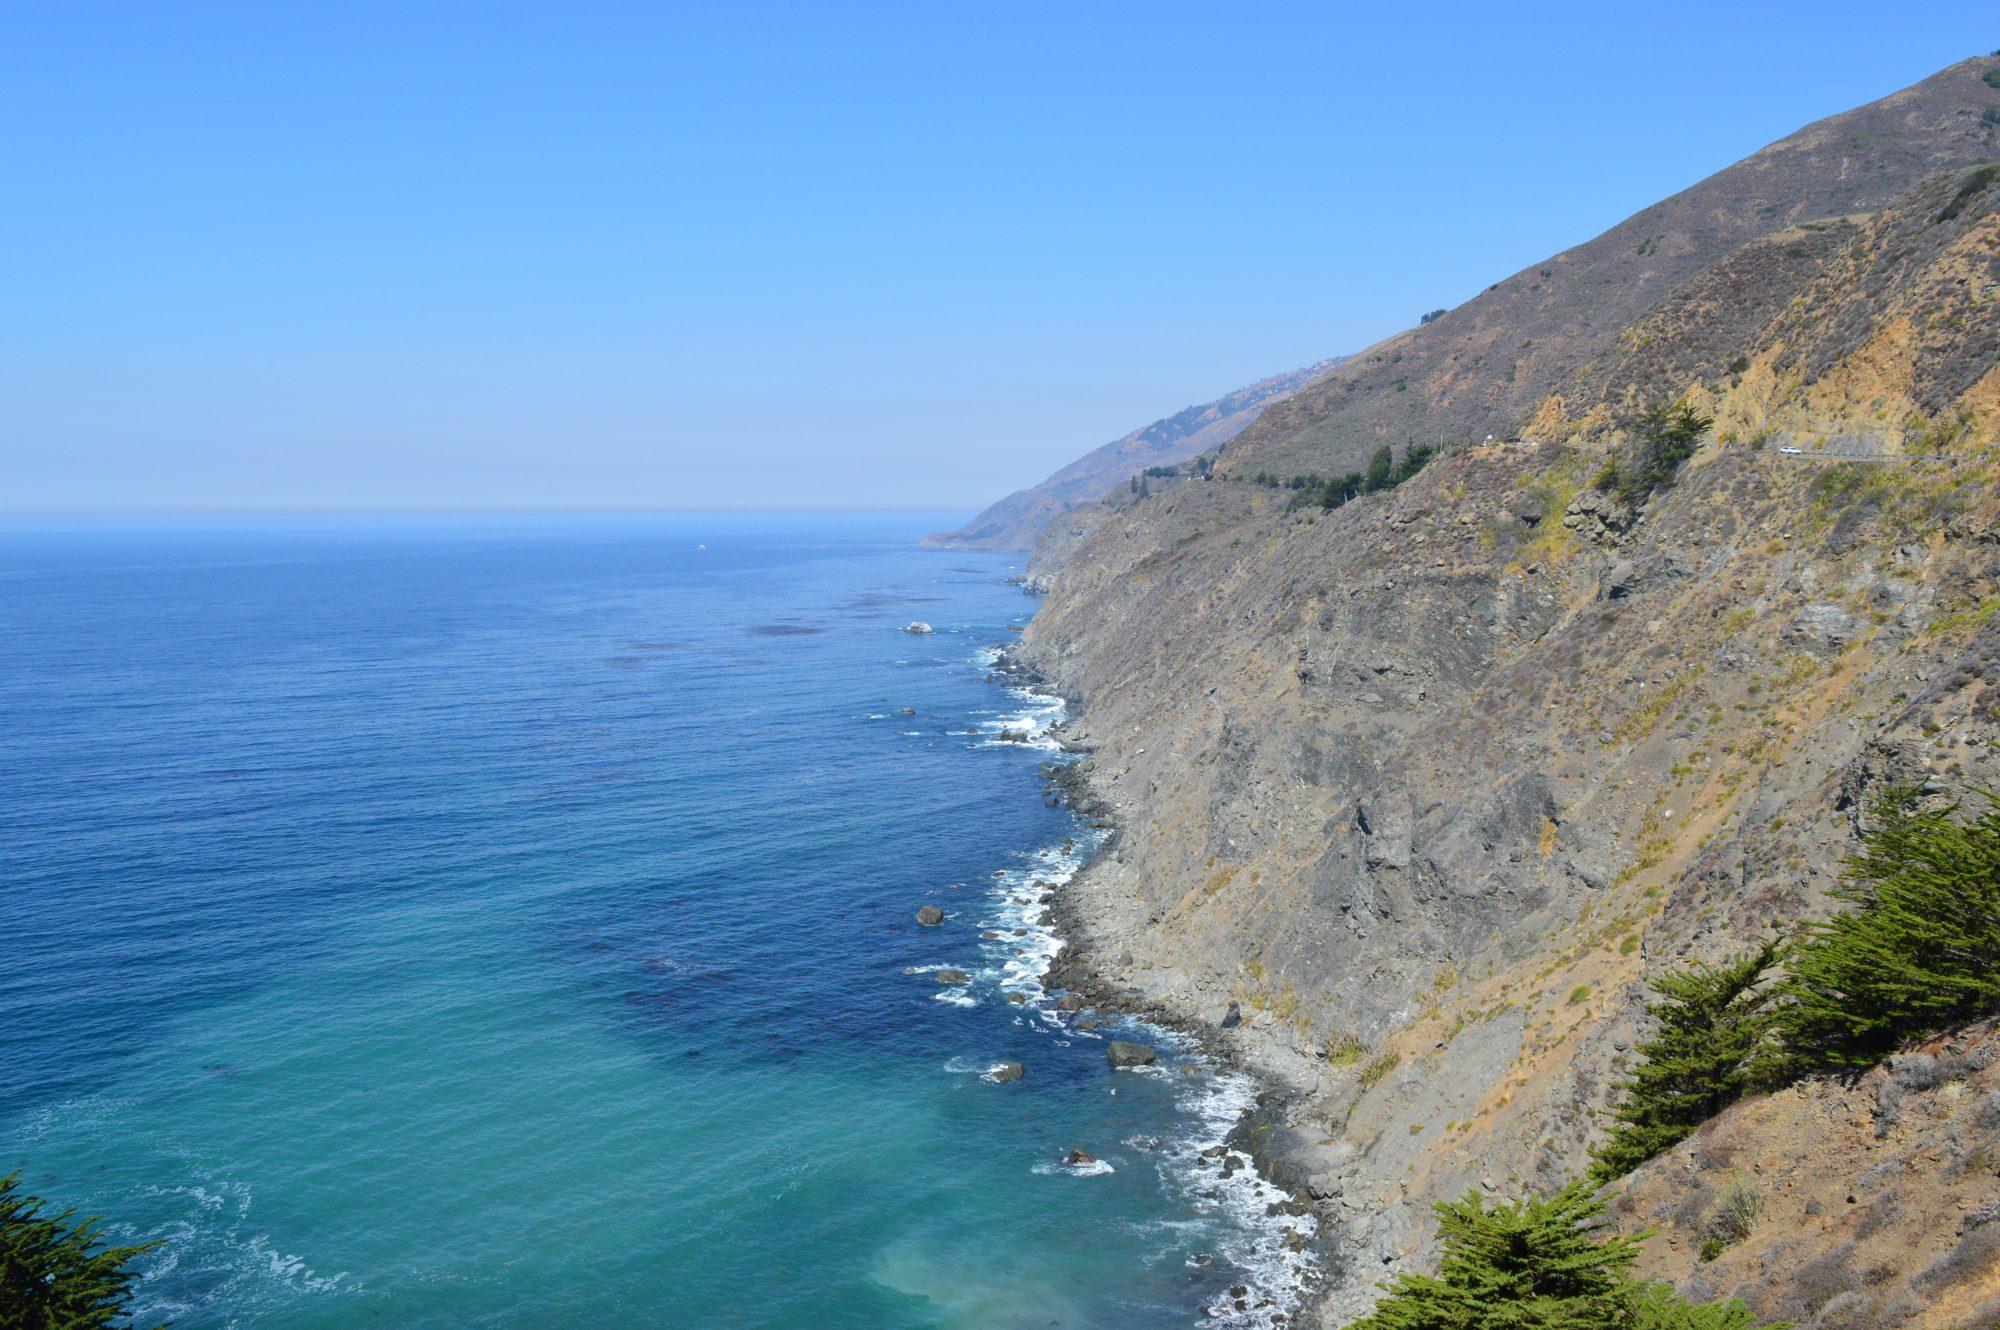 Ragged Point – Portal to Big Sur